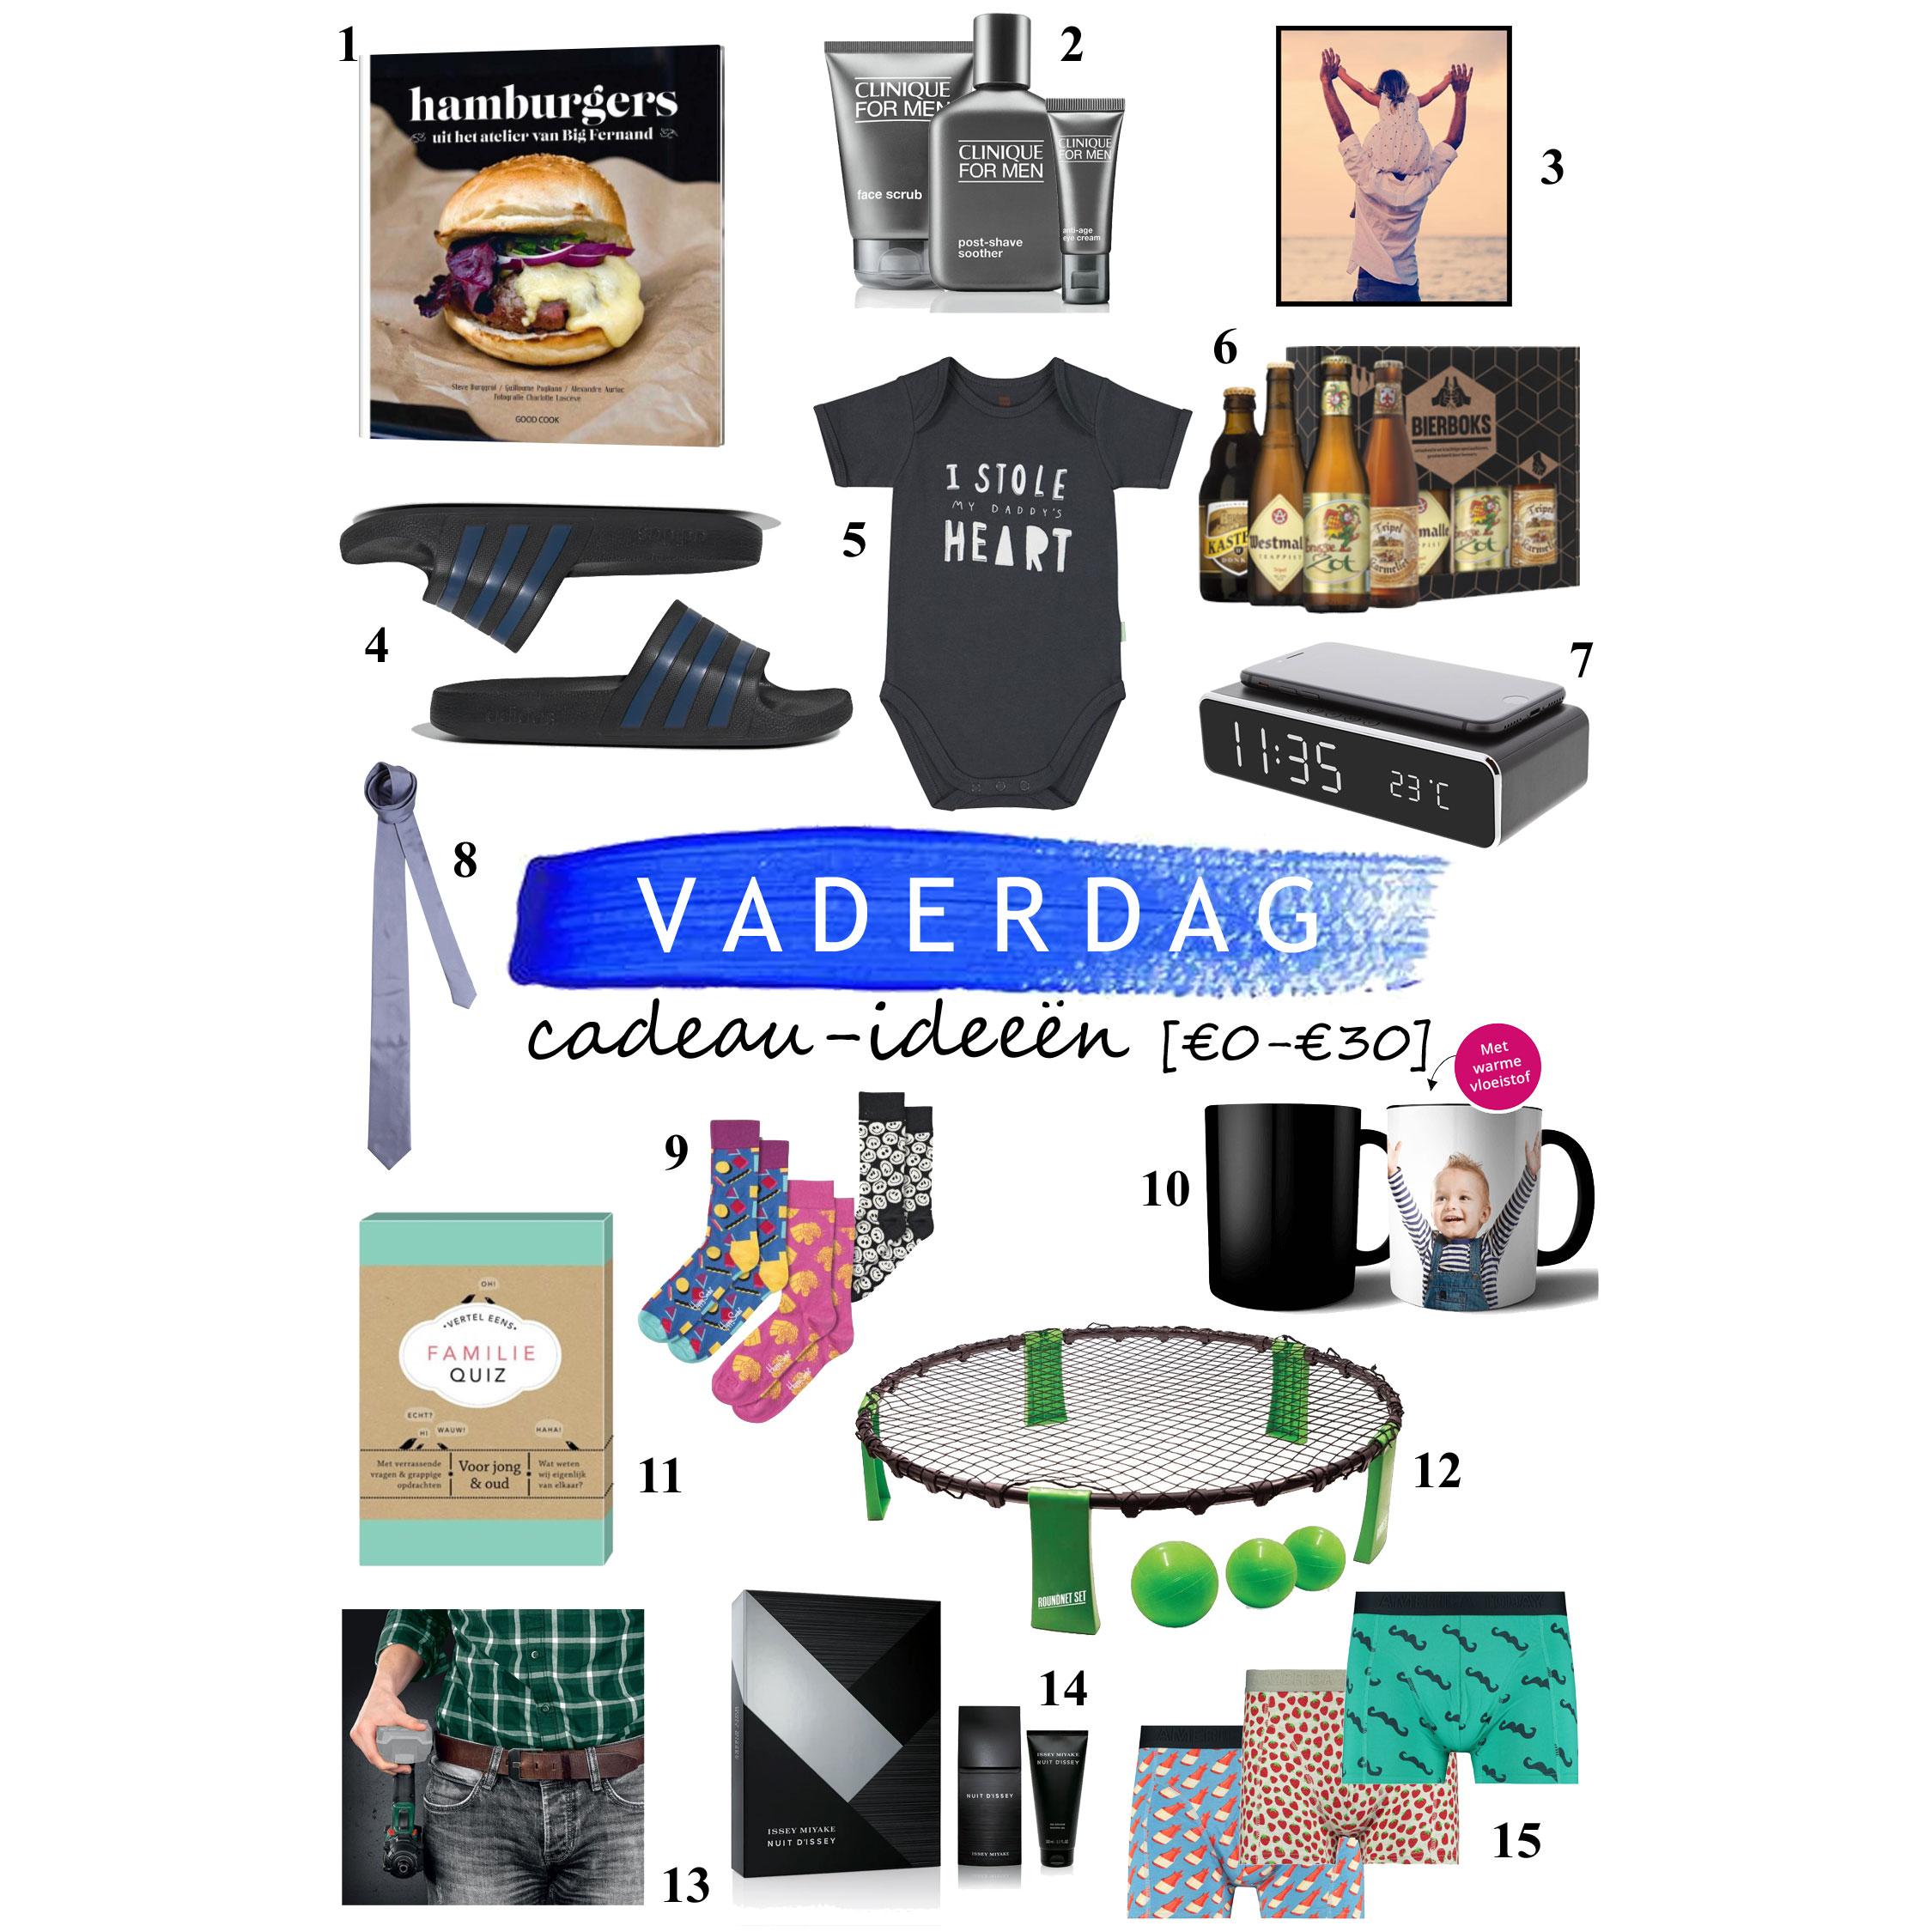 21 juni Vaderdag - 15 budget cadeau-tips [€0 - €30]